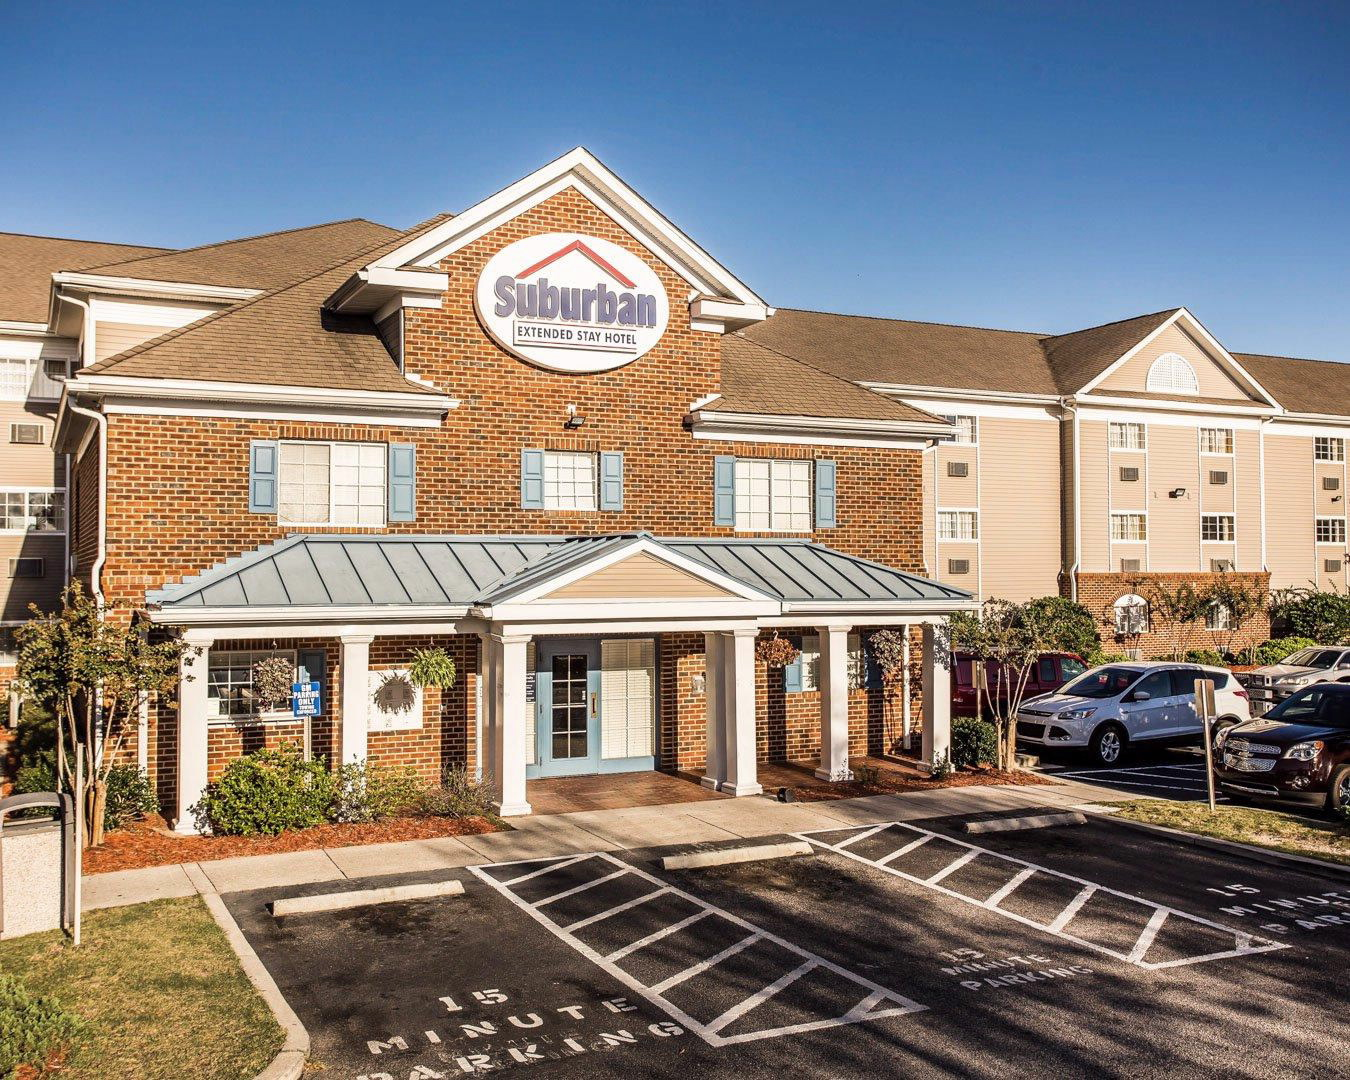 Suburban Extended Stay Hotel  Myrtle Beach South Carolina  Sc